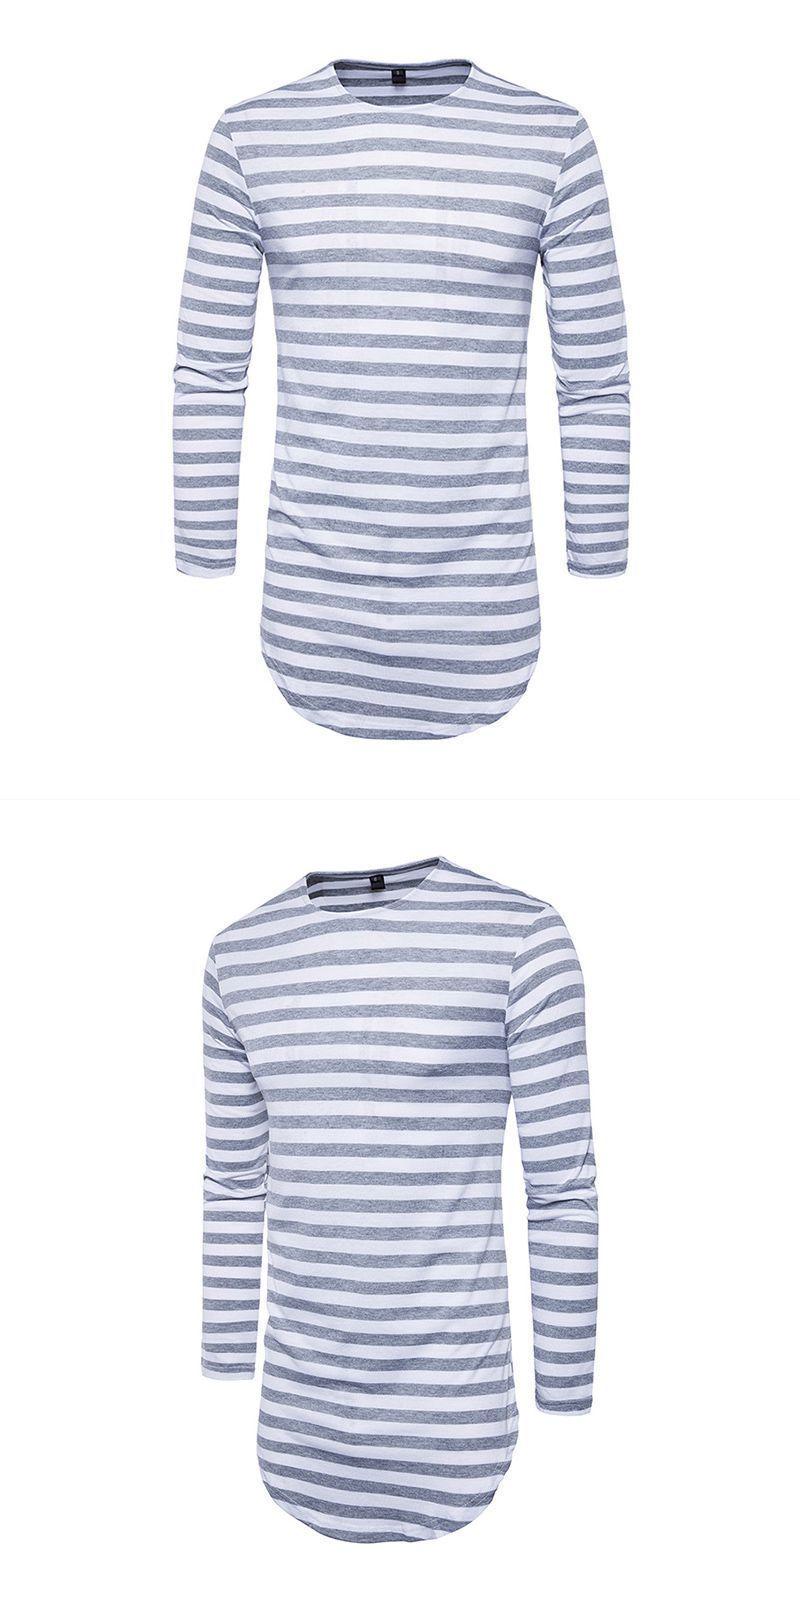 3cb6e07b908 Wholesale four colors available men cotton long sleeves stripes printed t- shirt  man